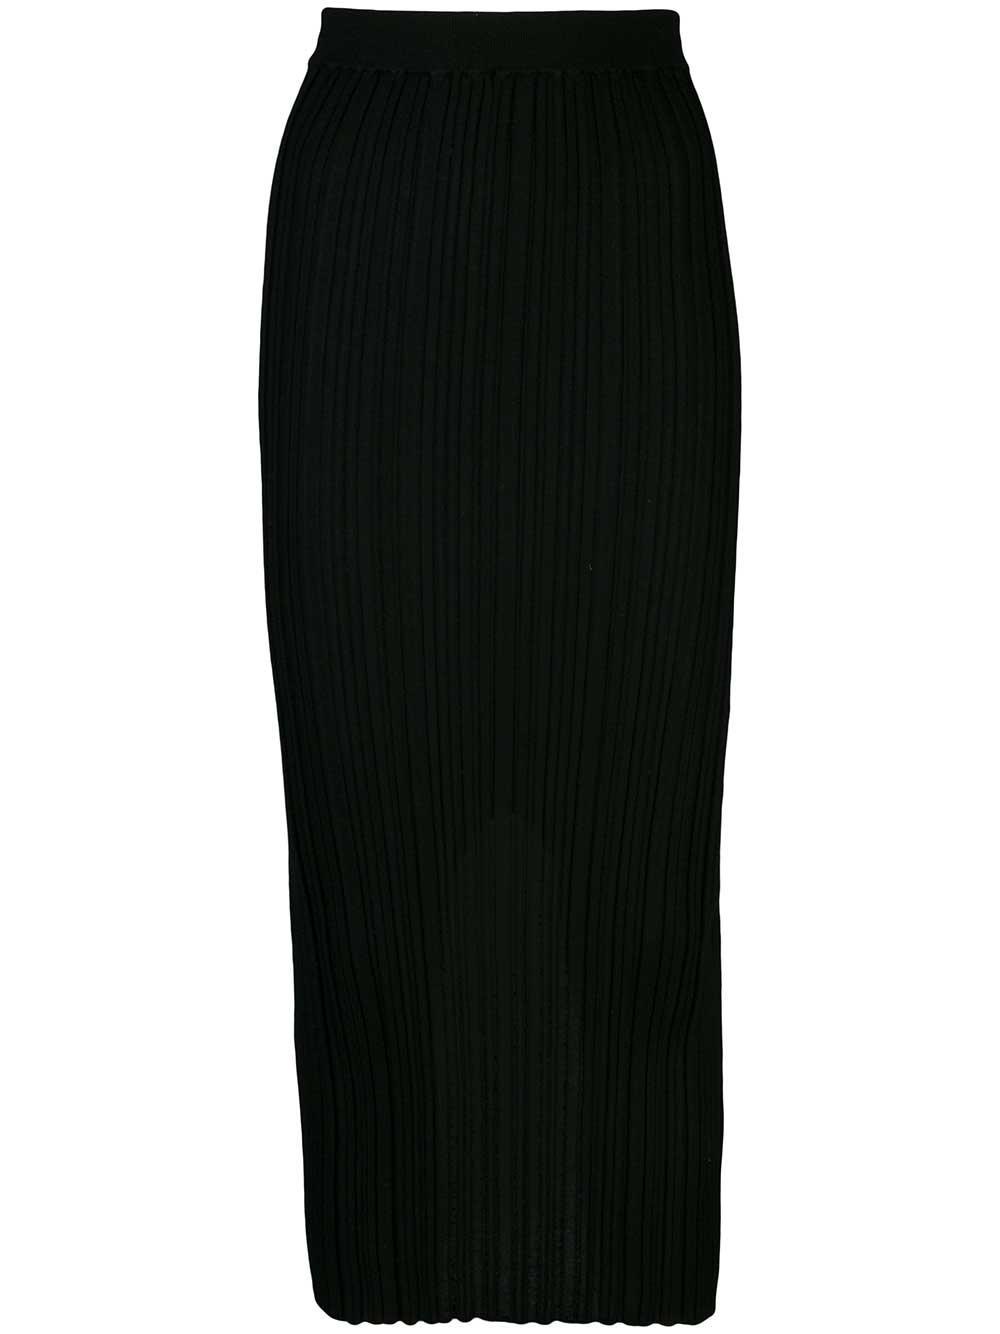 Fine Wool Rib Skirt